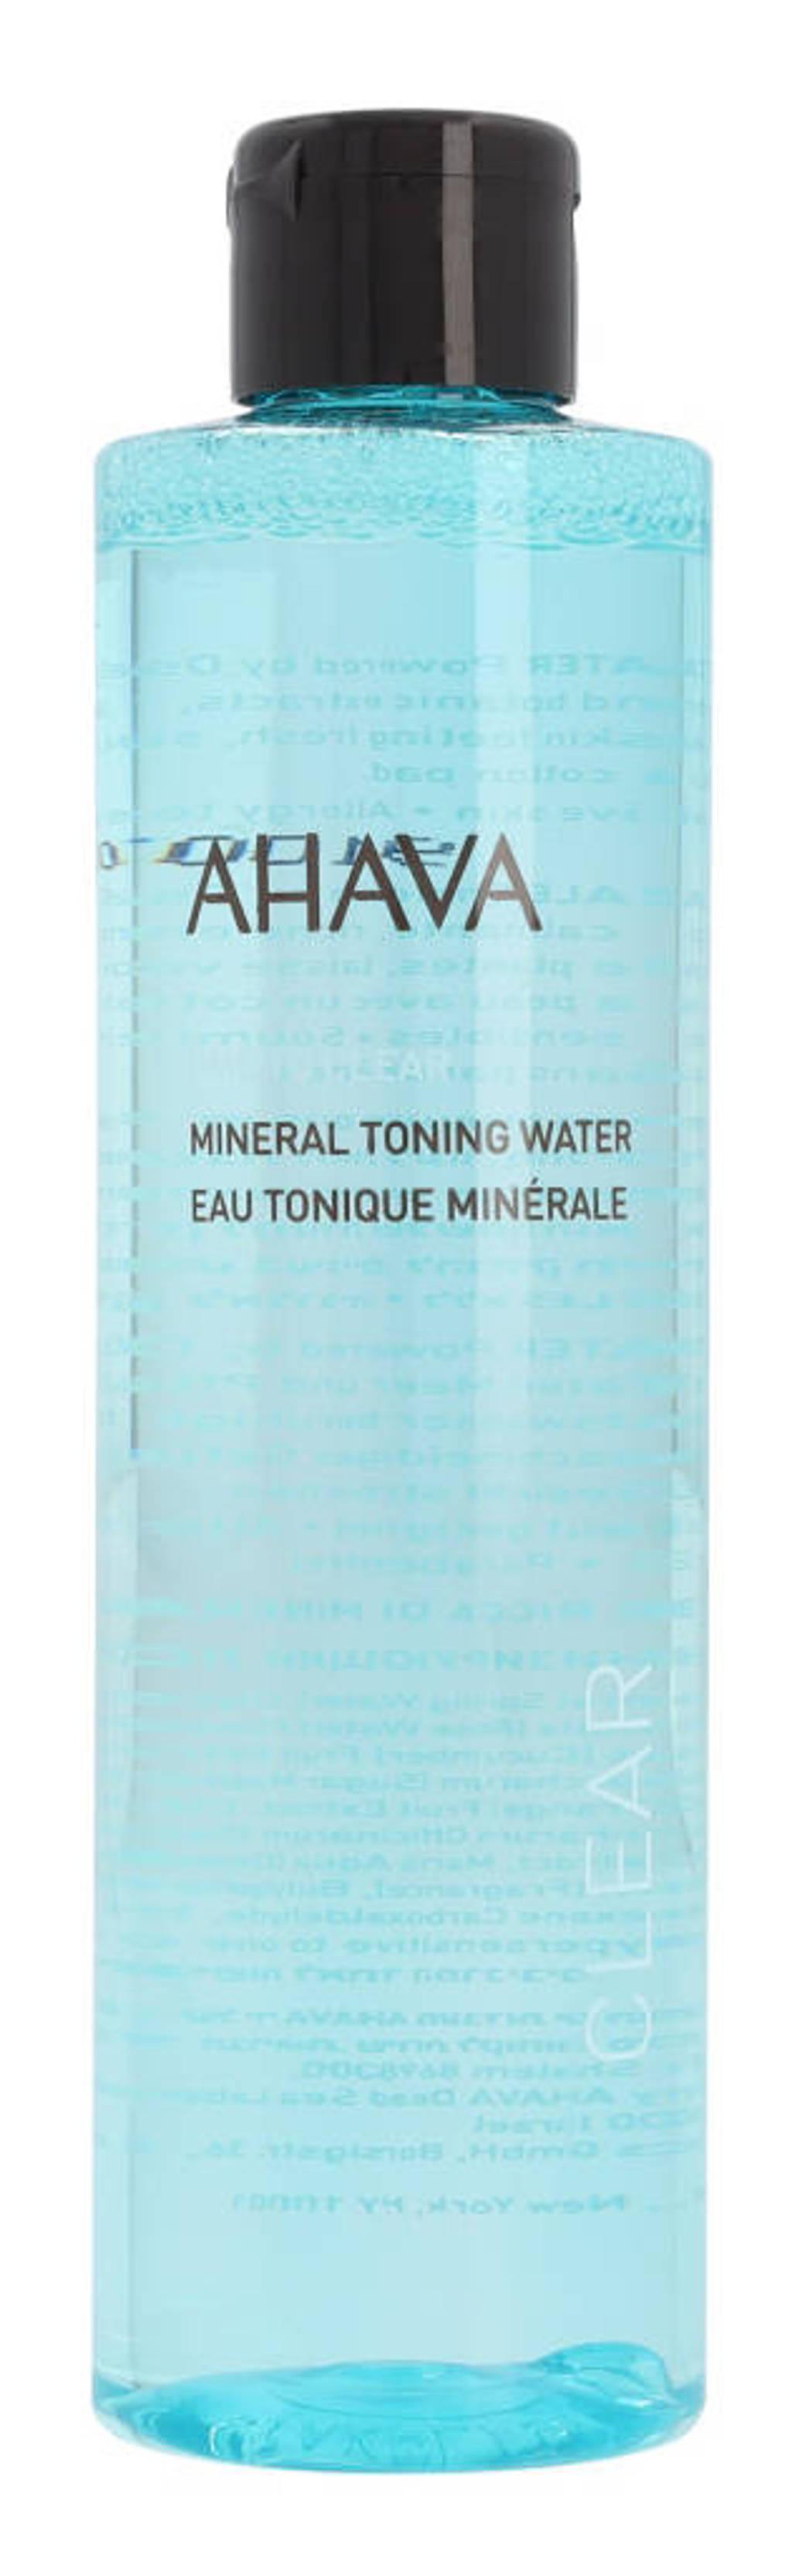 Ahava Mineral Toning Water reinigingslotion - 250 ml